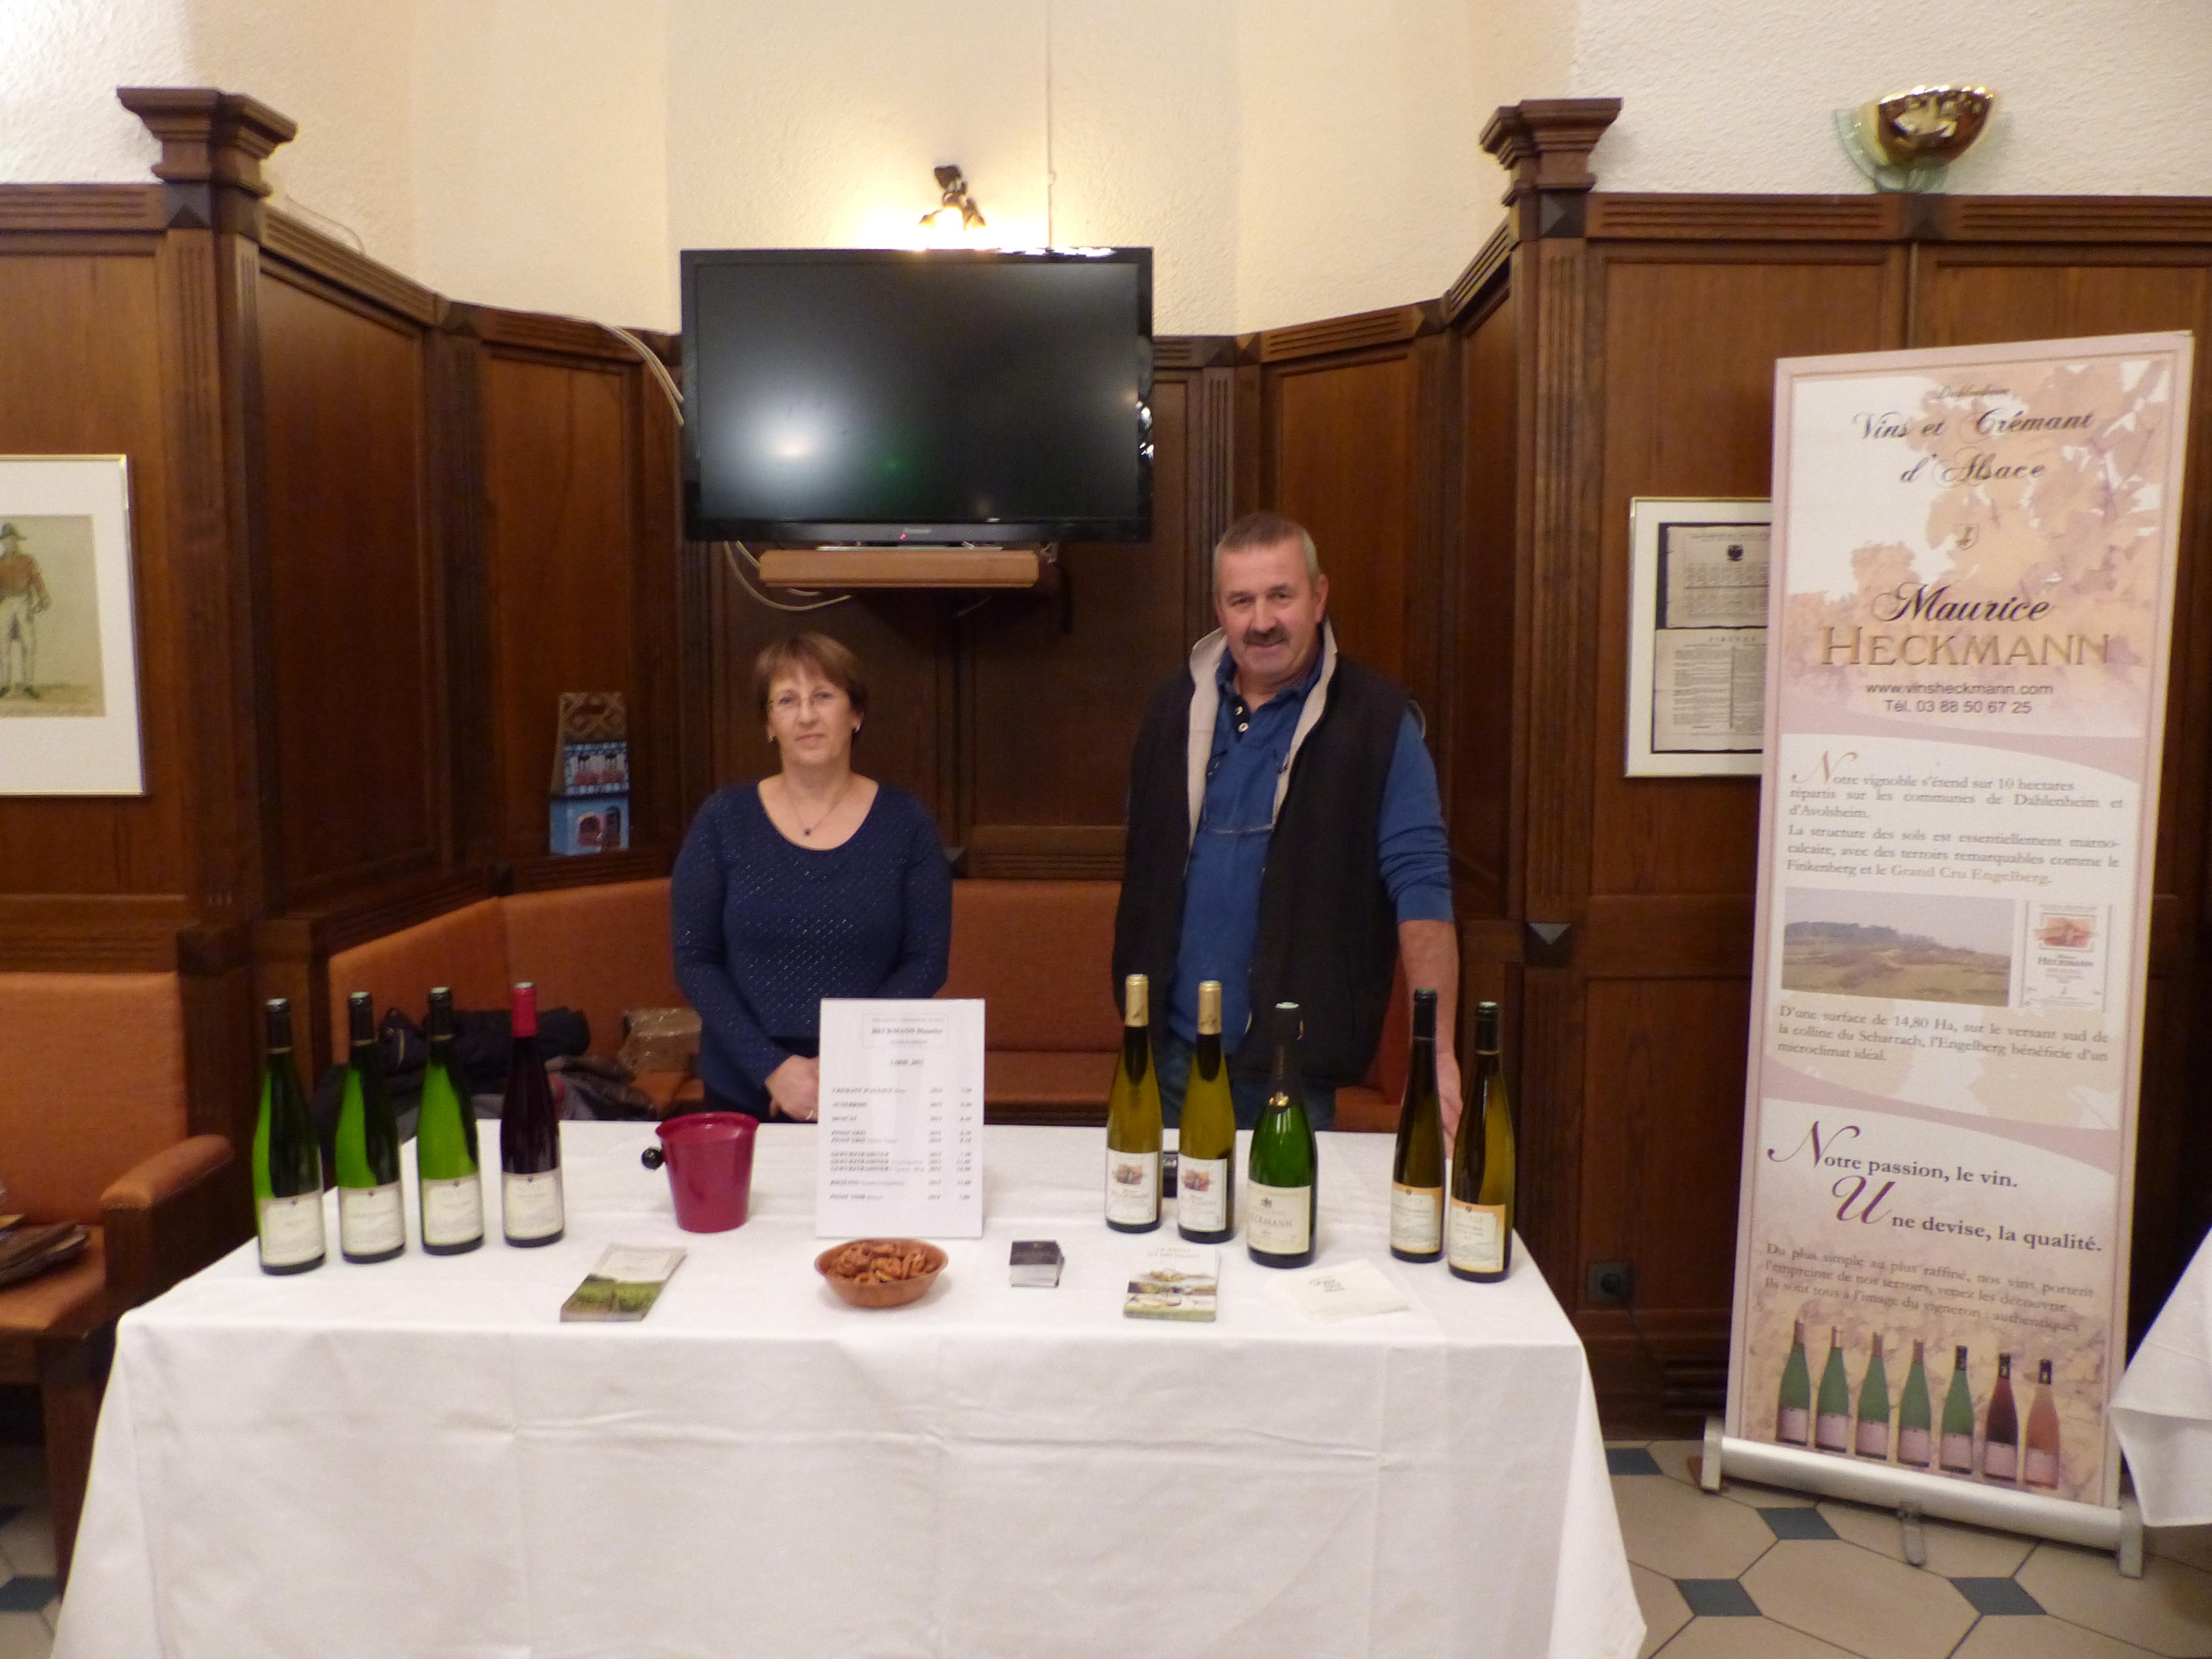 Alsatian Wine Tasting And Wine Market U2013 The European Parliamentary  Association